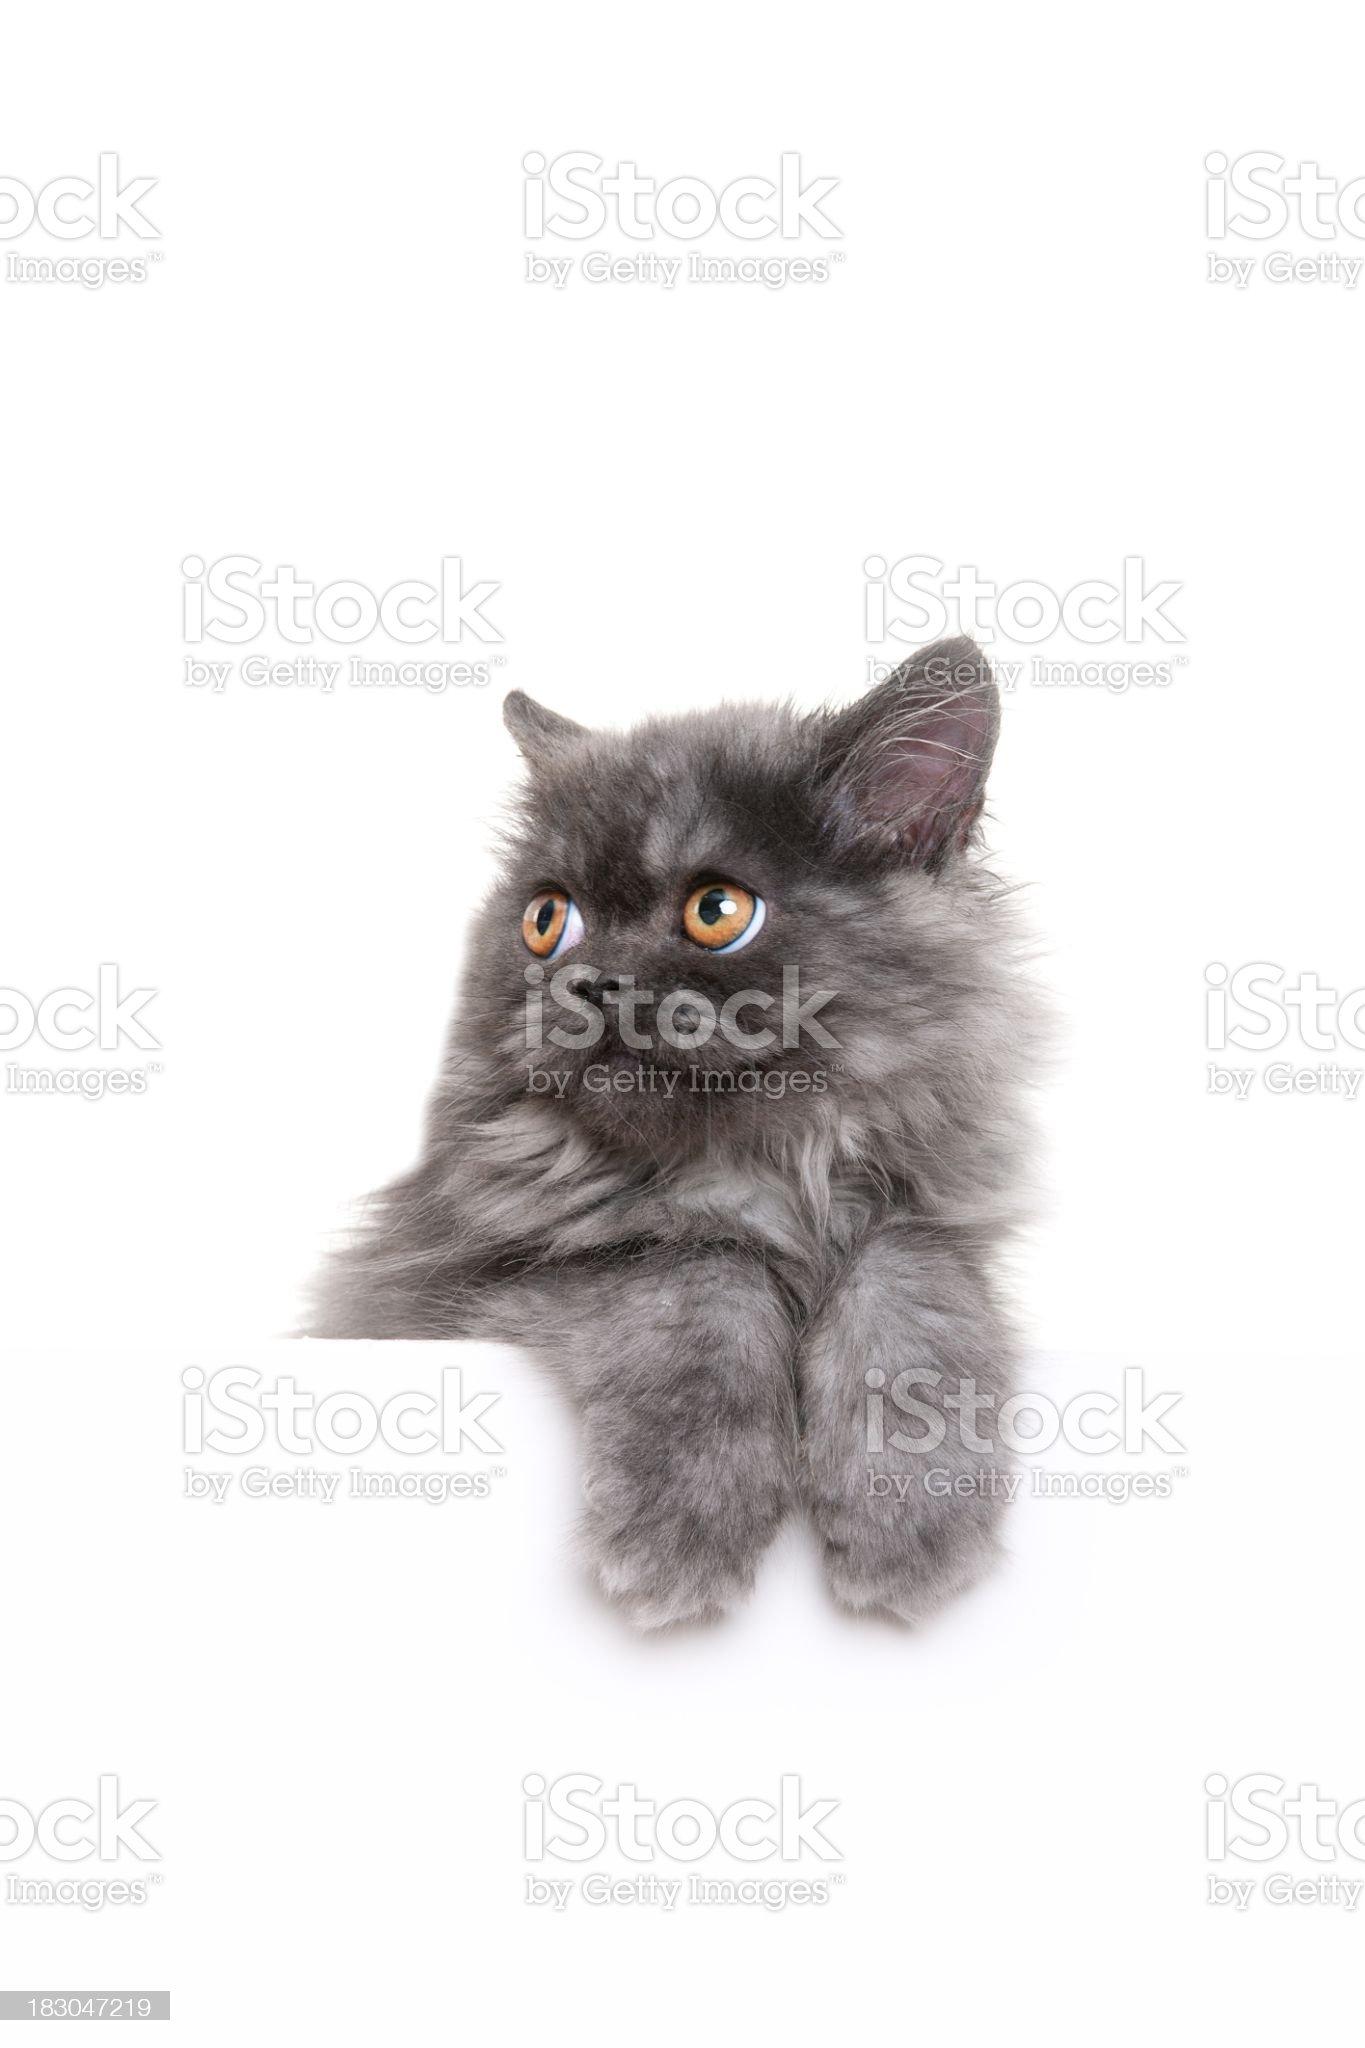 gray kitten royalty-free stock photo